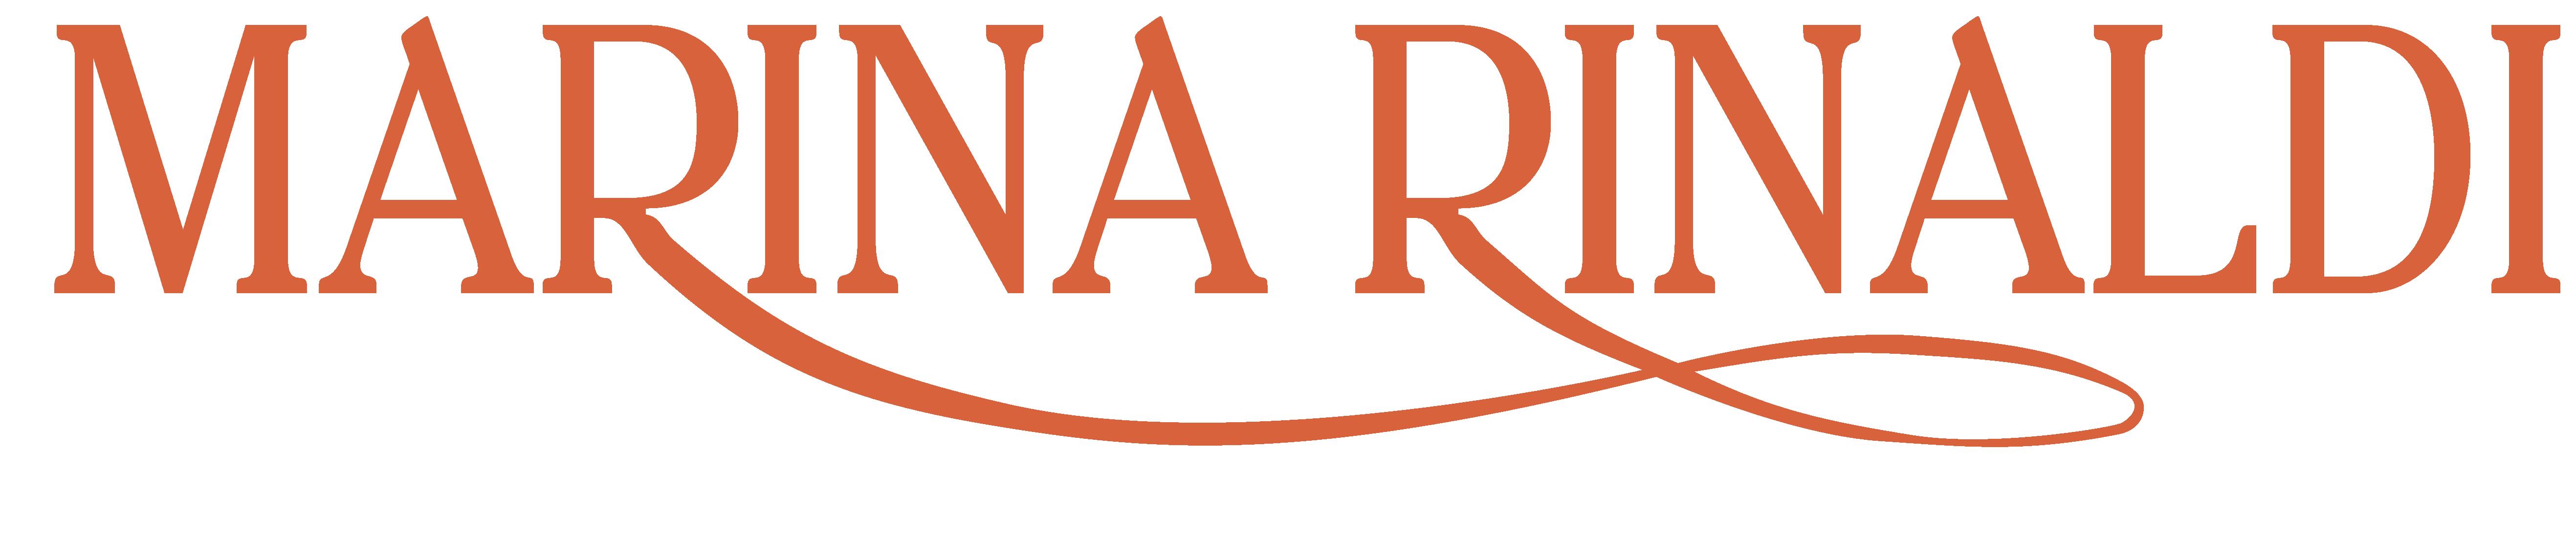 Customer Microlog Retail Marina Rinaldi